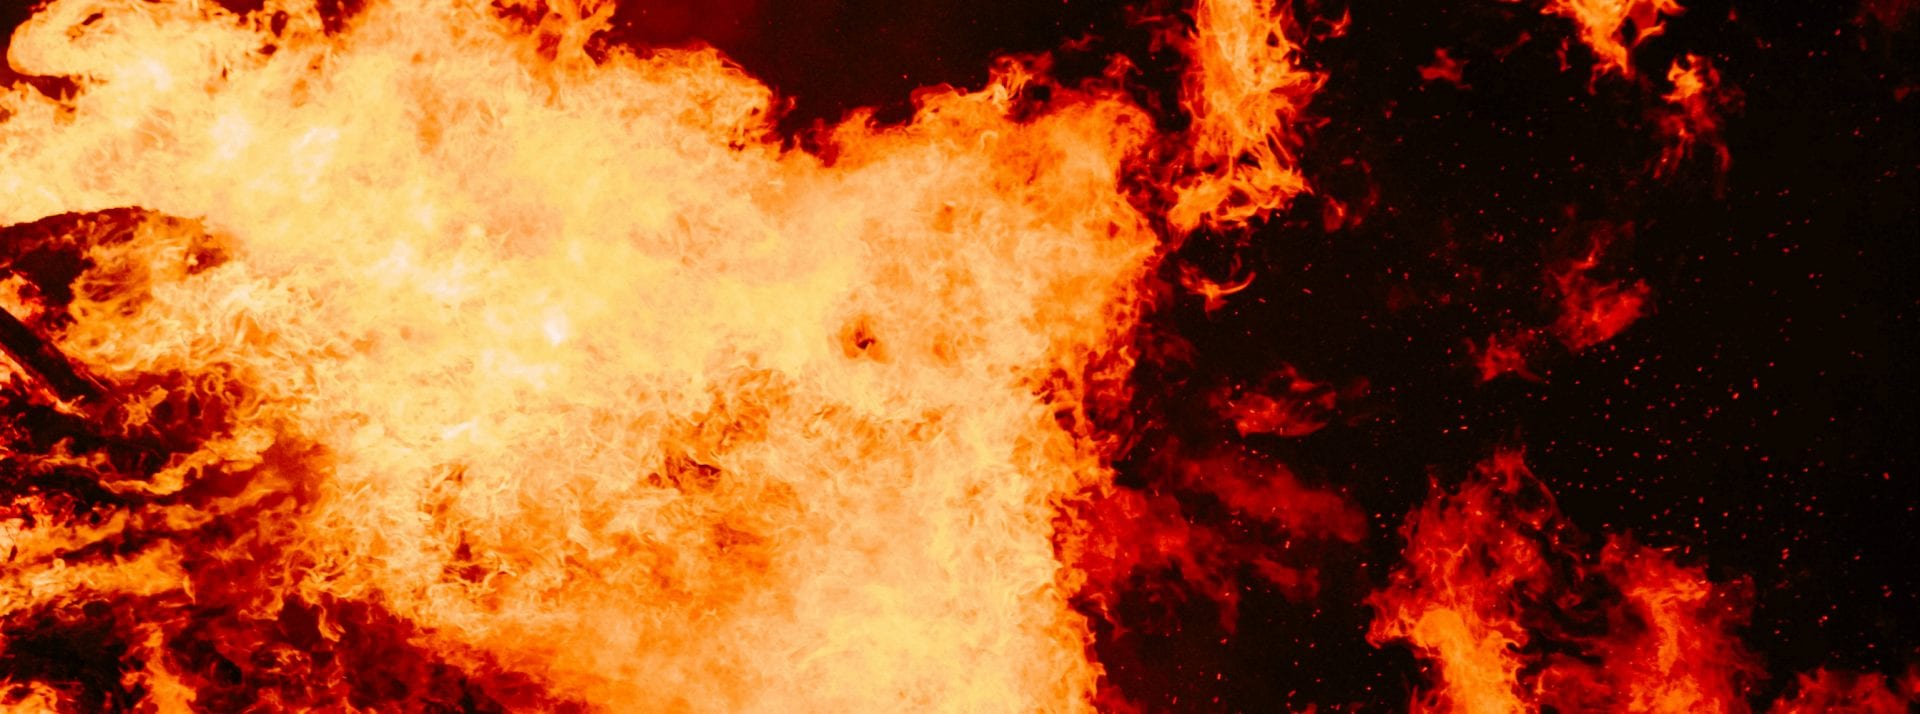 paraclete advocate holy ghost 6th Sunday Easter A paraclito avvocato spirito santo